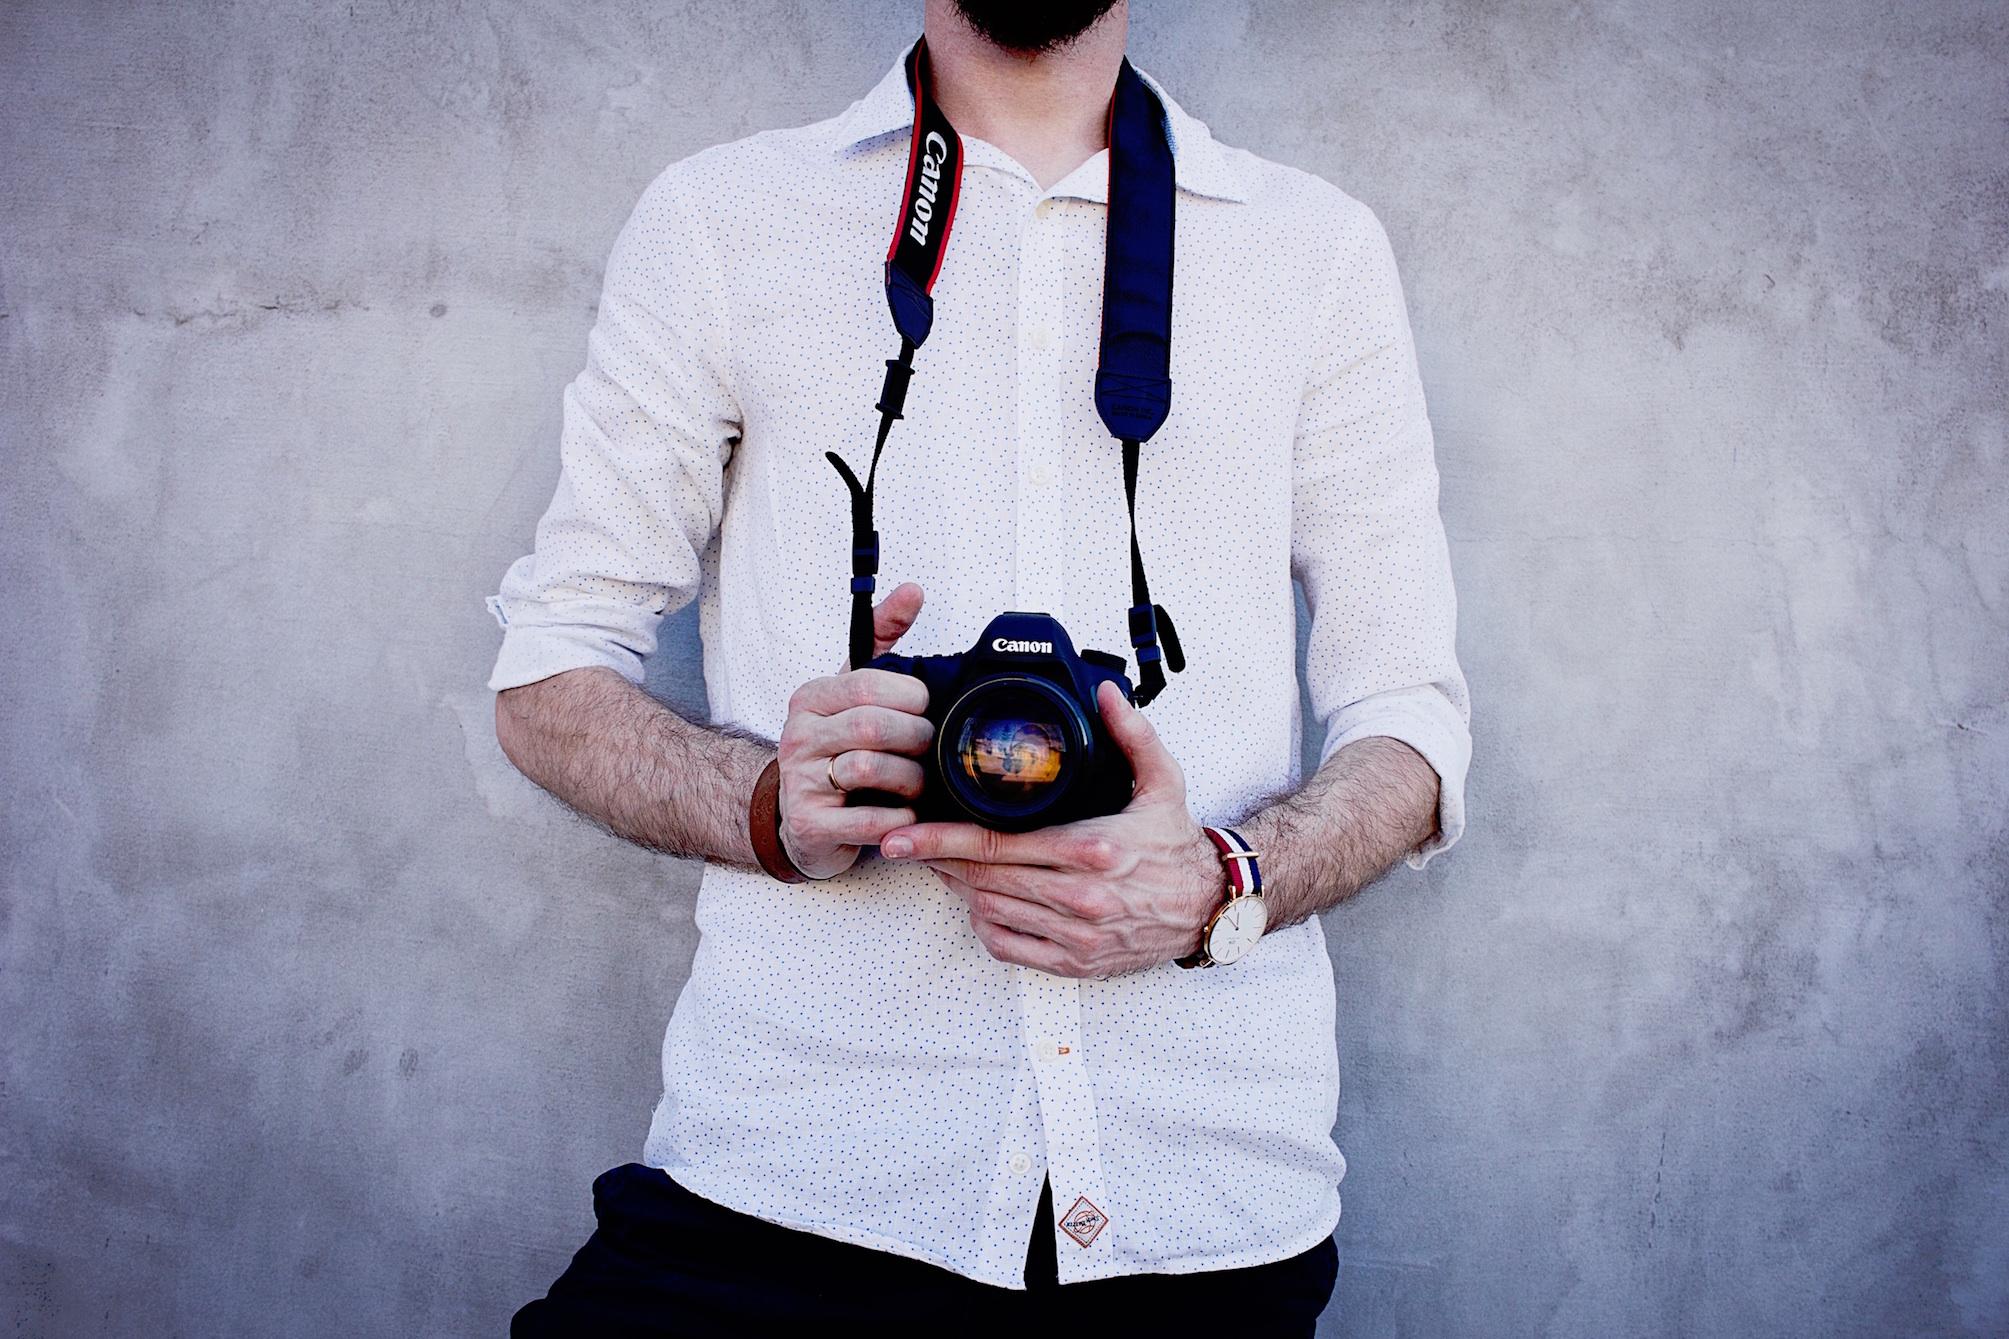 Genbook photographer